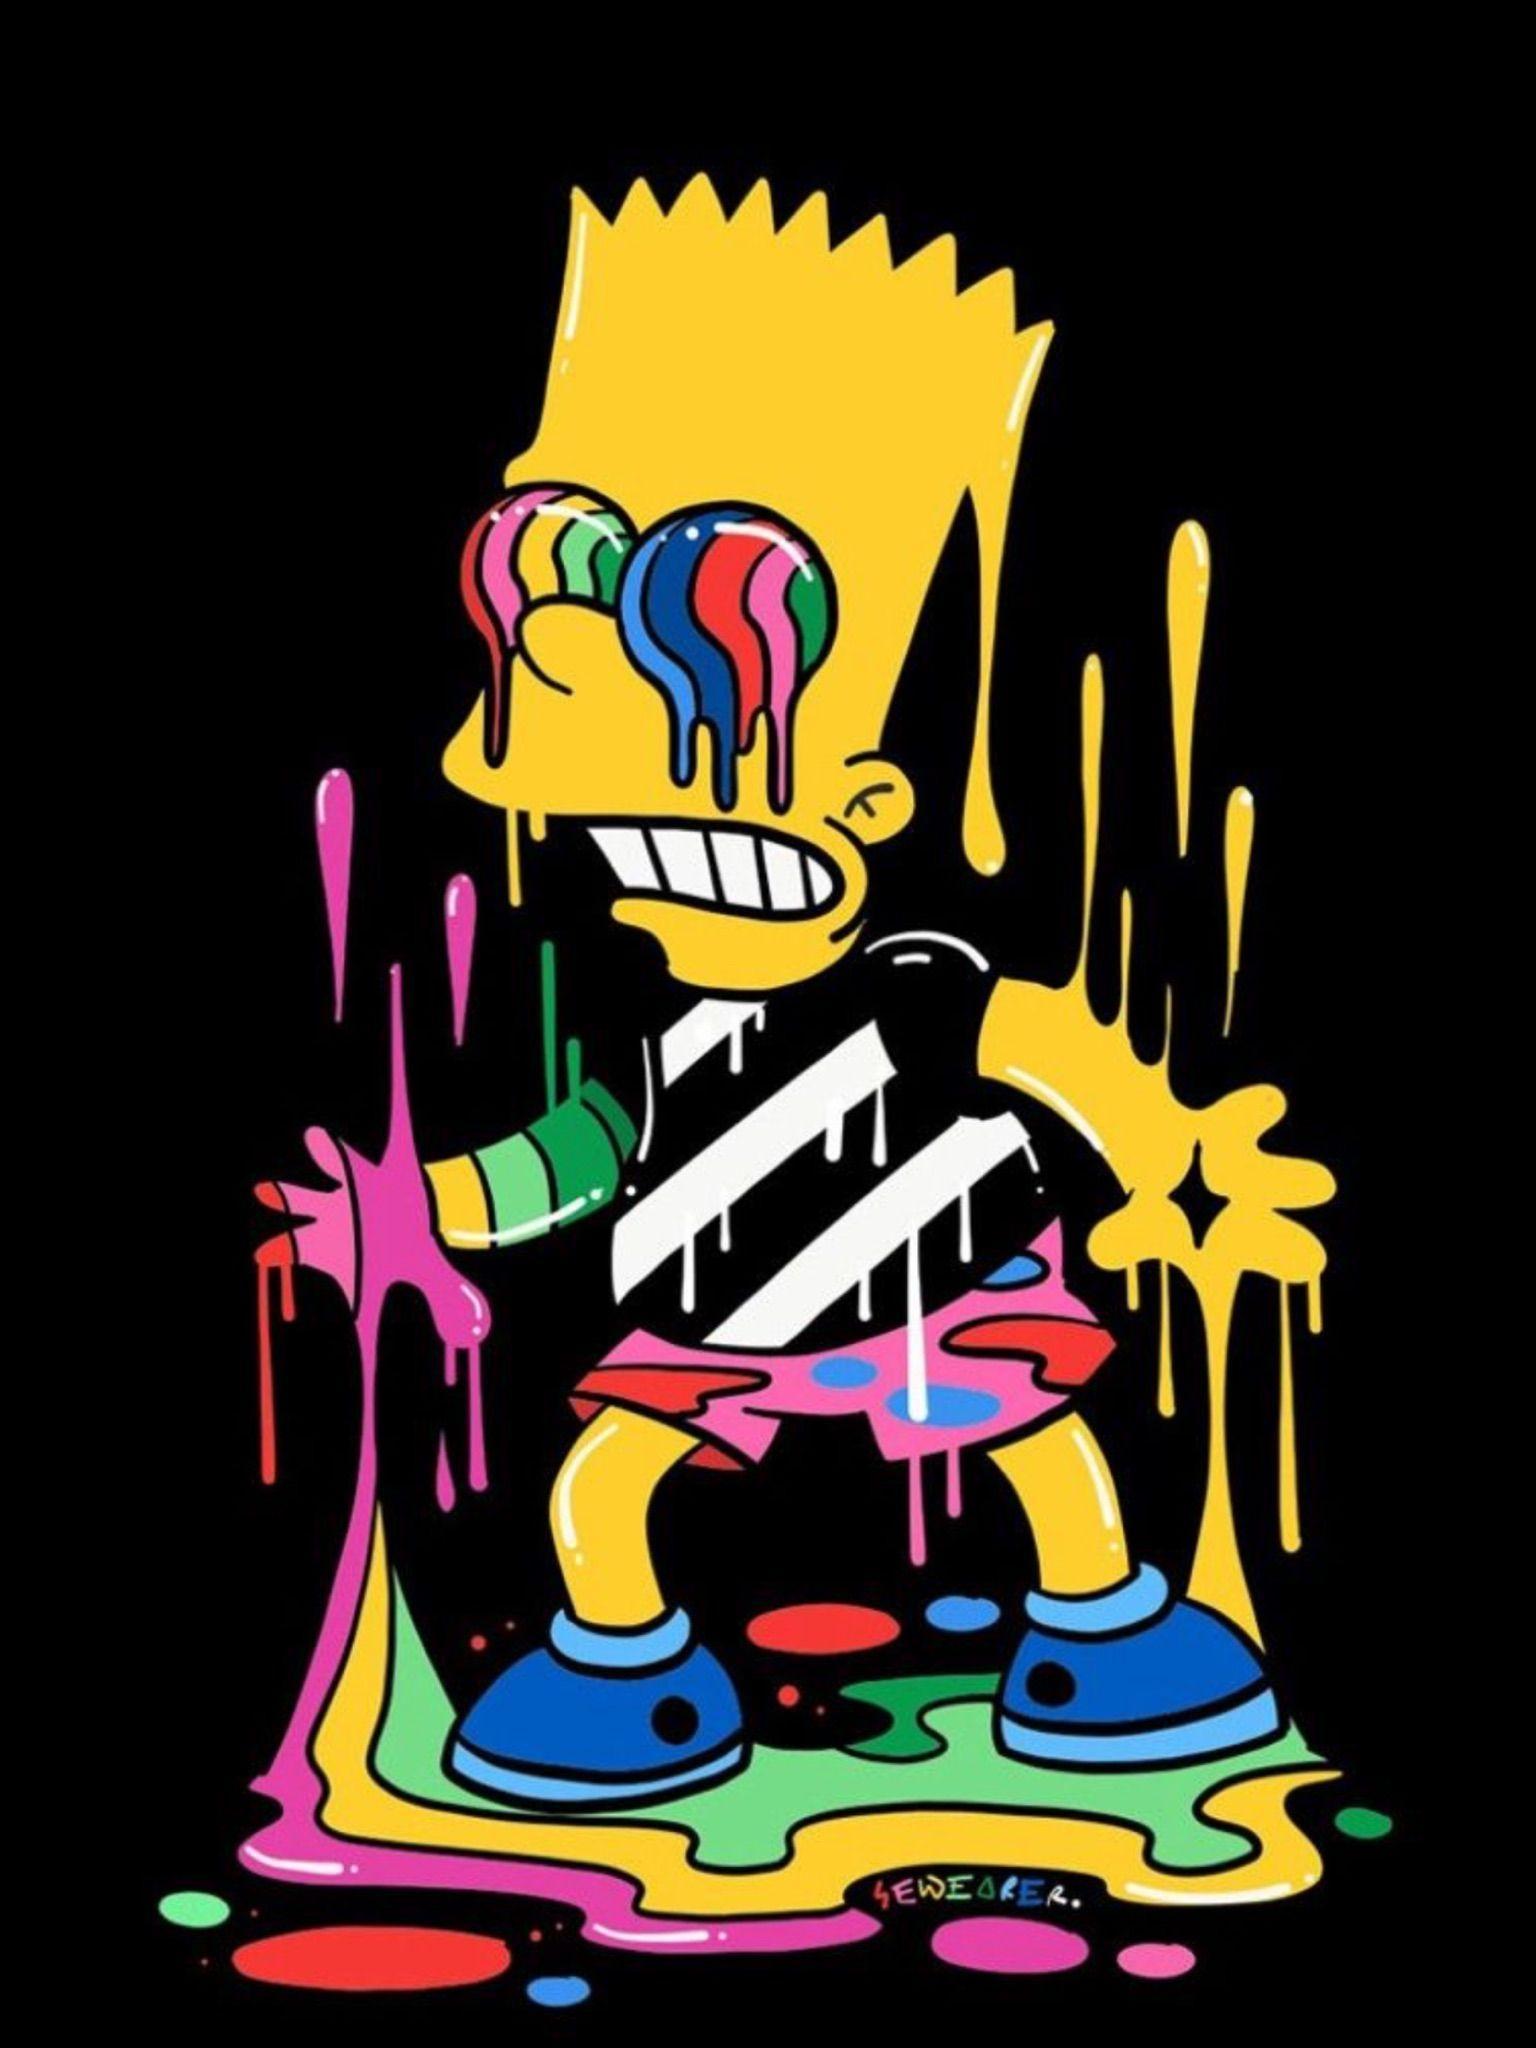 Bart Sad Wallpapers Top Free Bart Sad Backgrounds